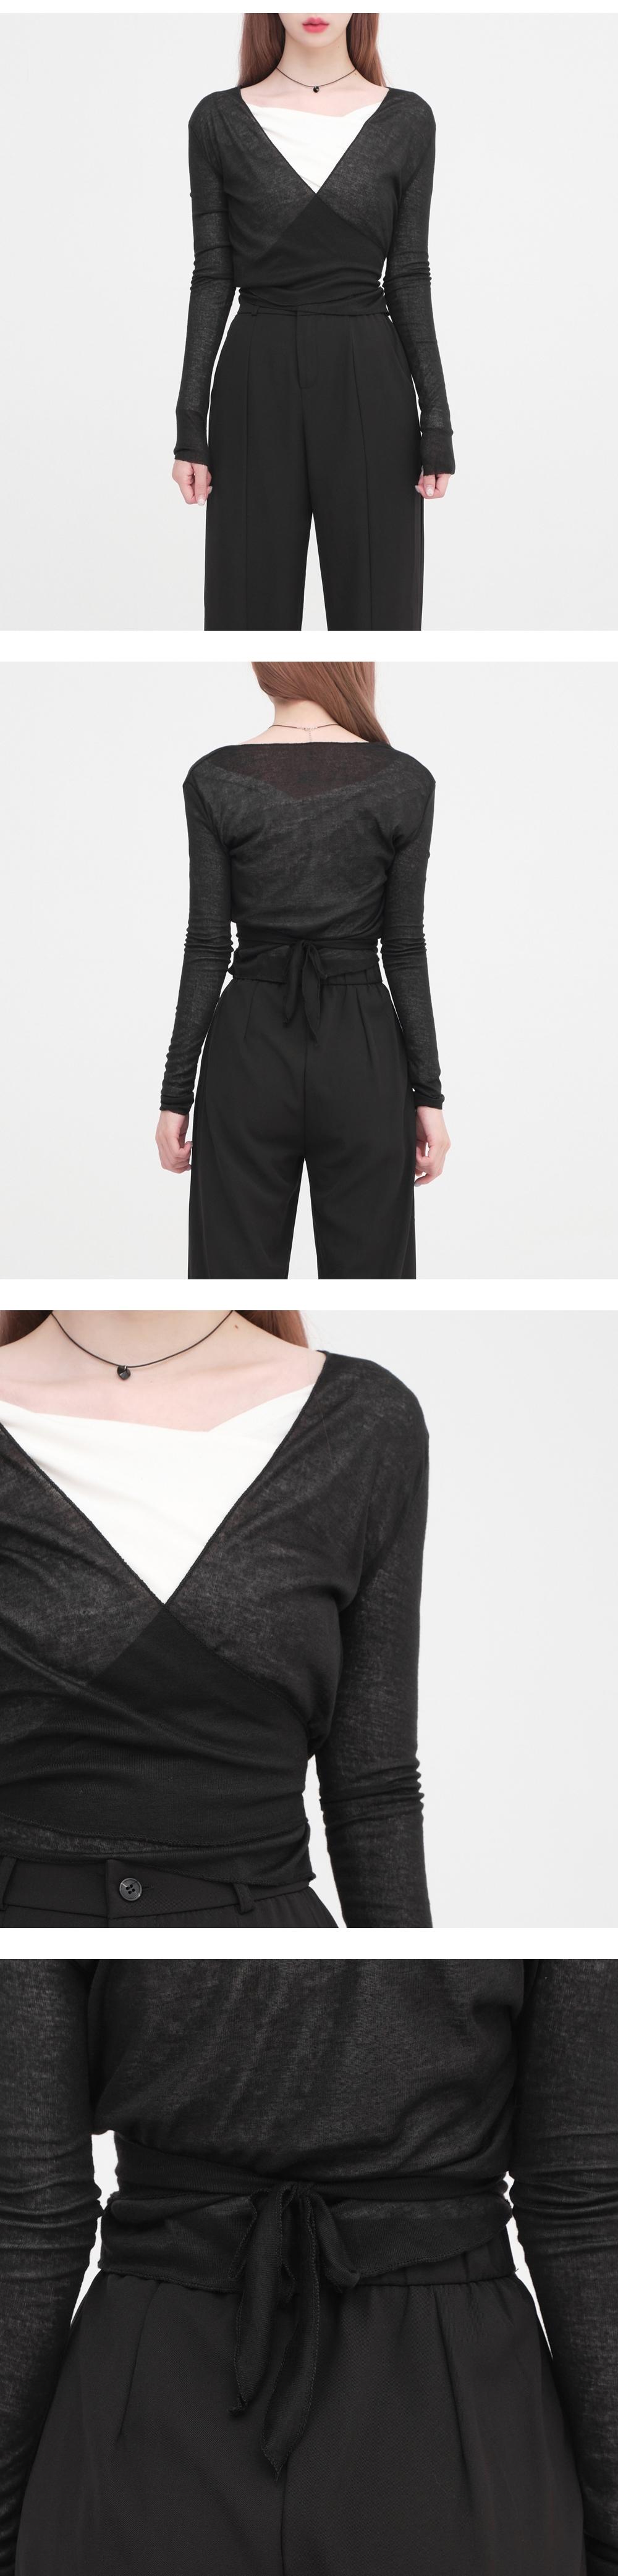 choi strap cropped T-shirt